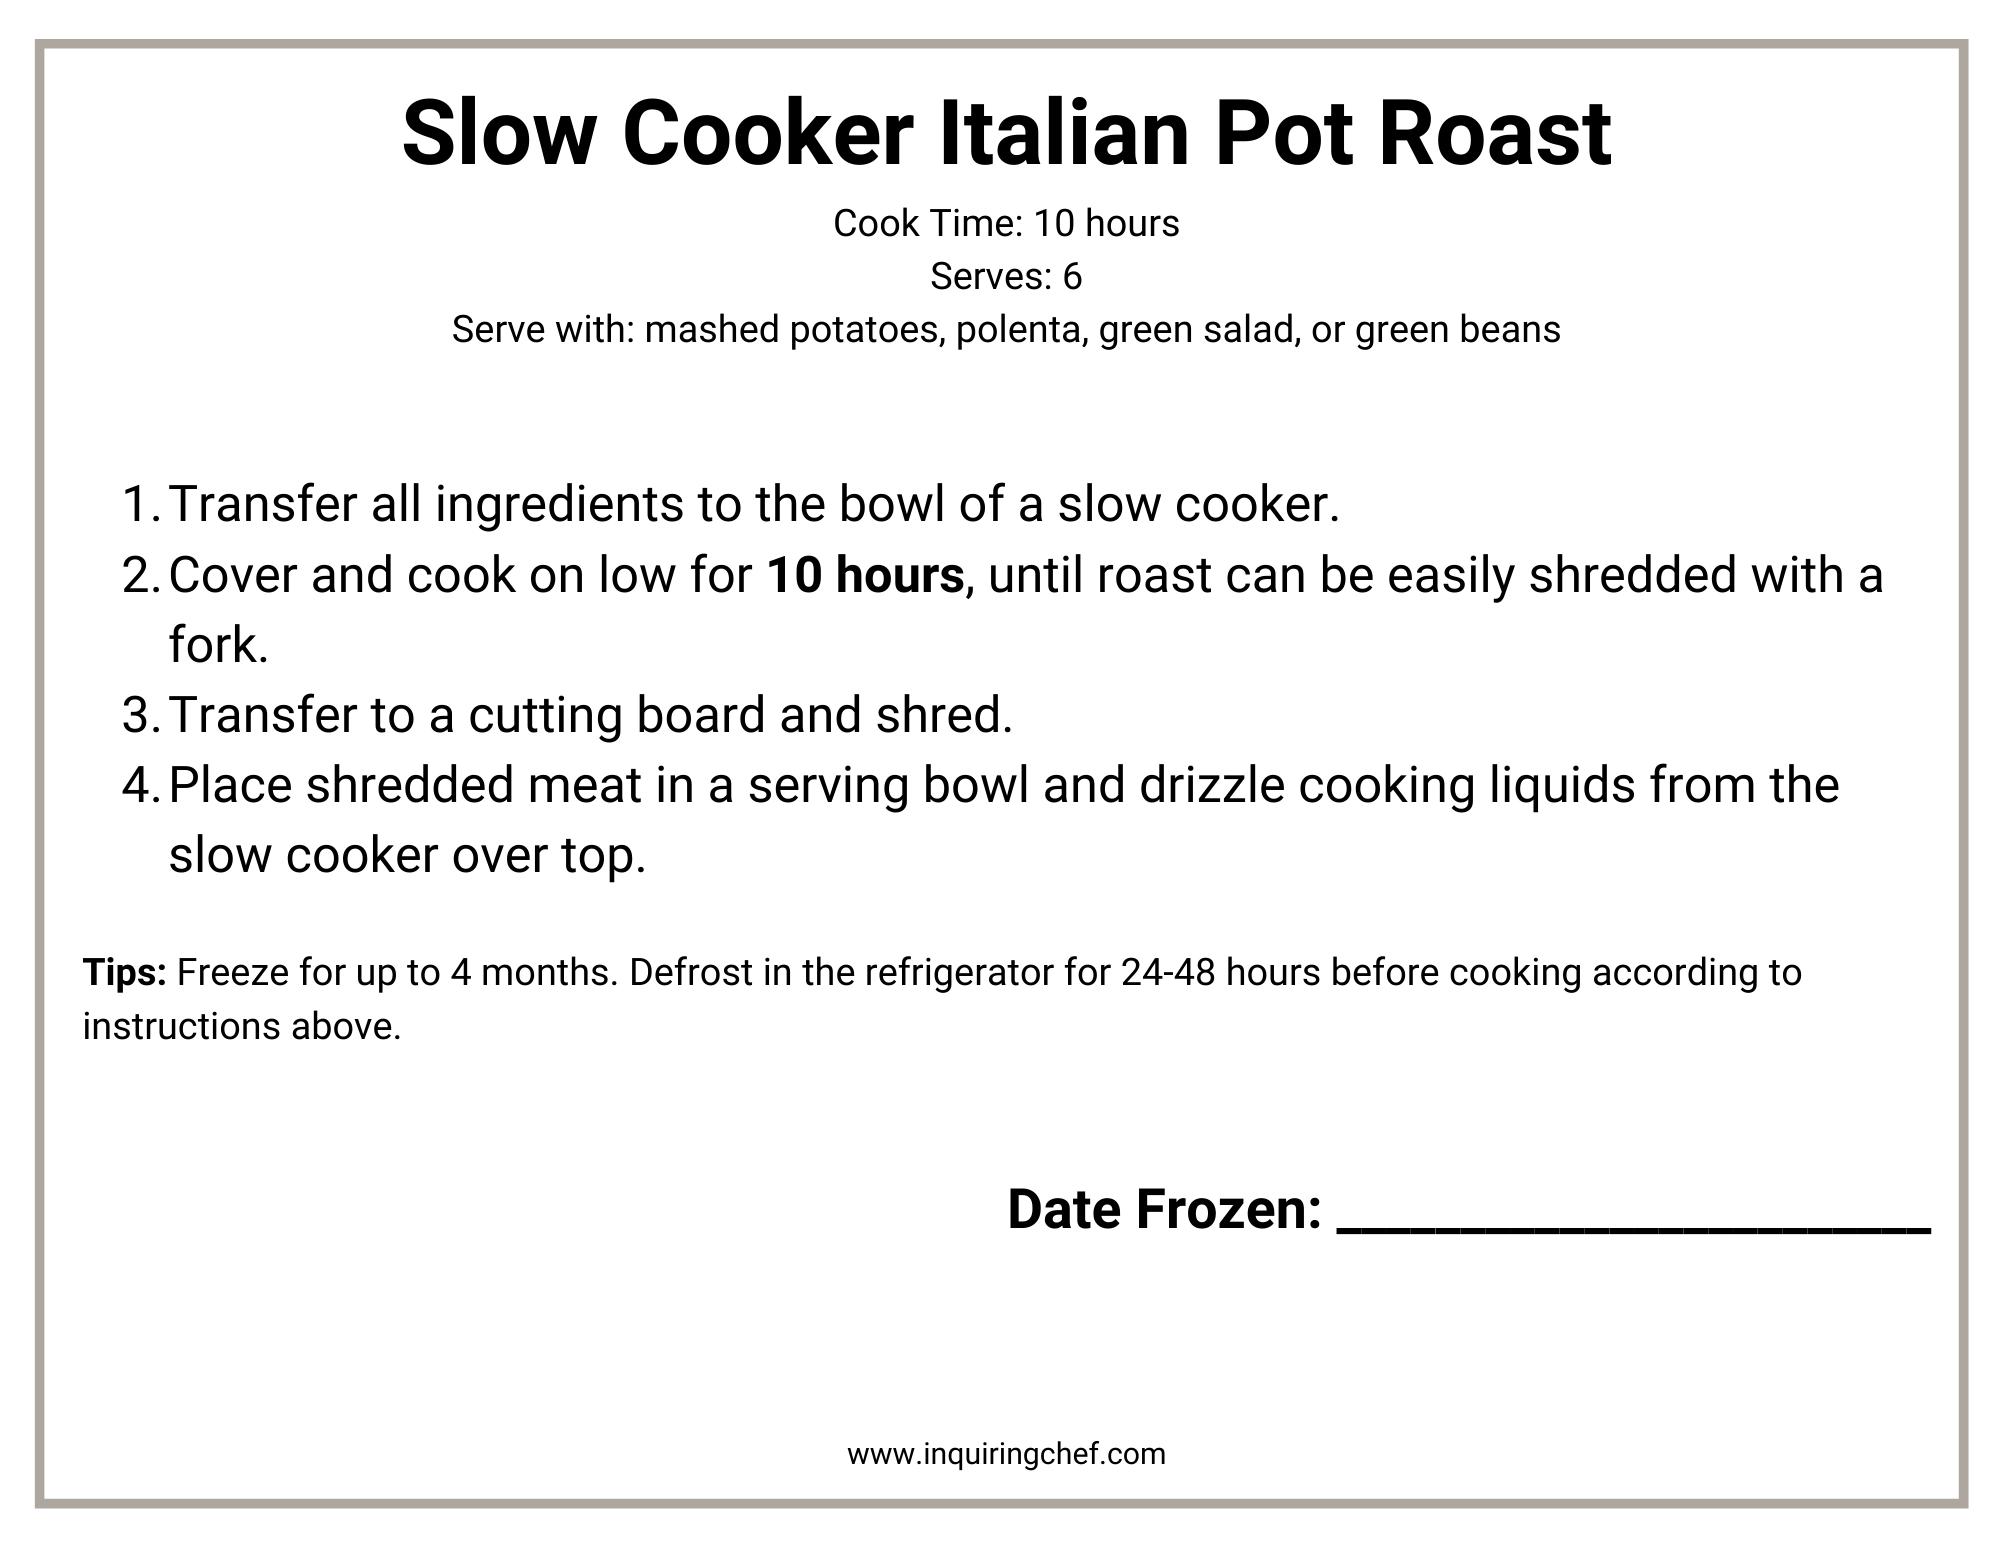 slow cooker italian pot roast freezer label